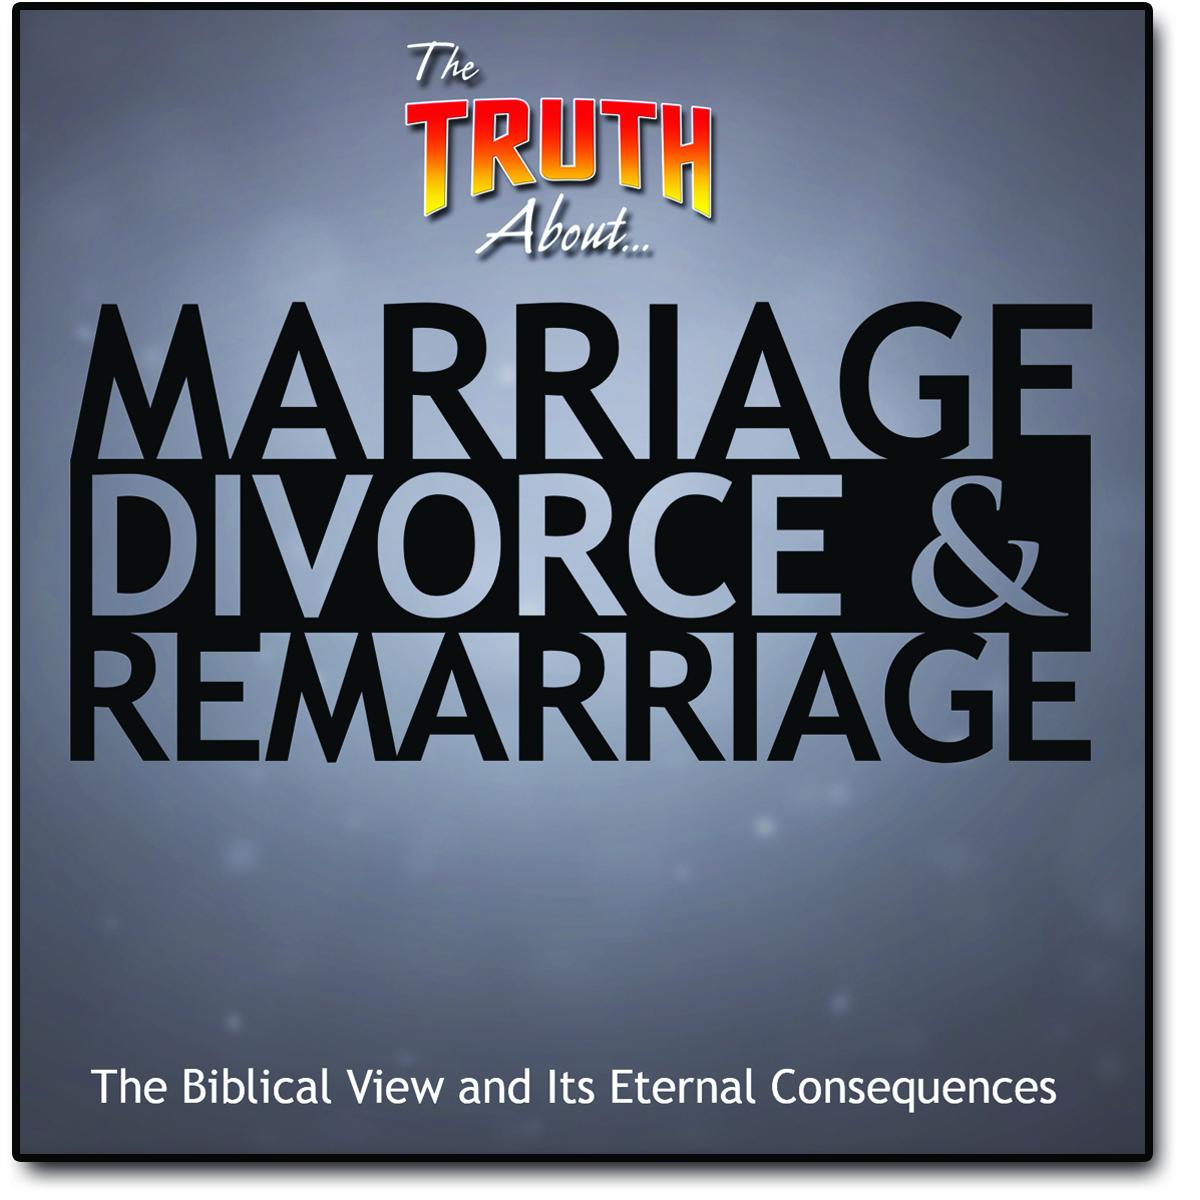 Marriage Divorce & Remarriage